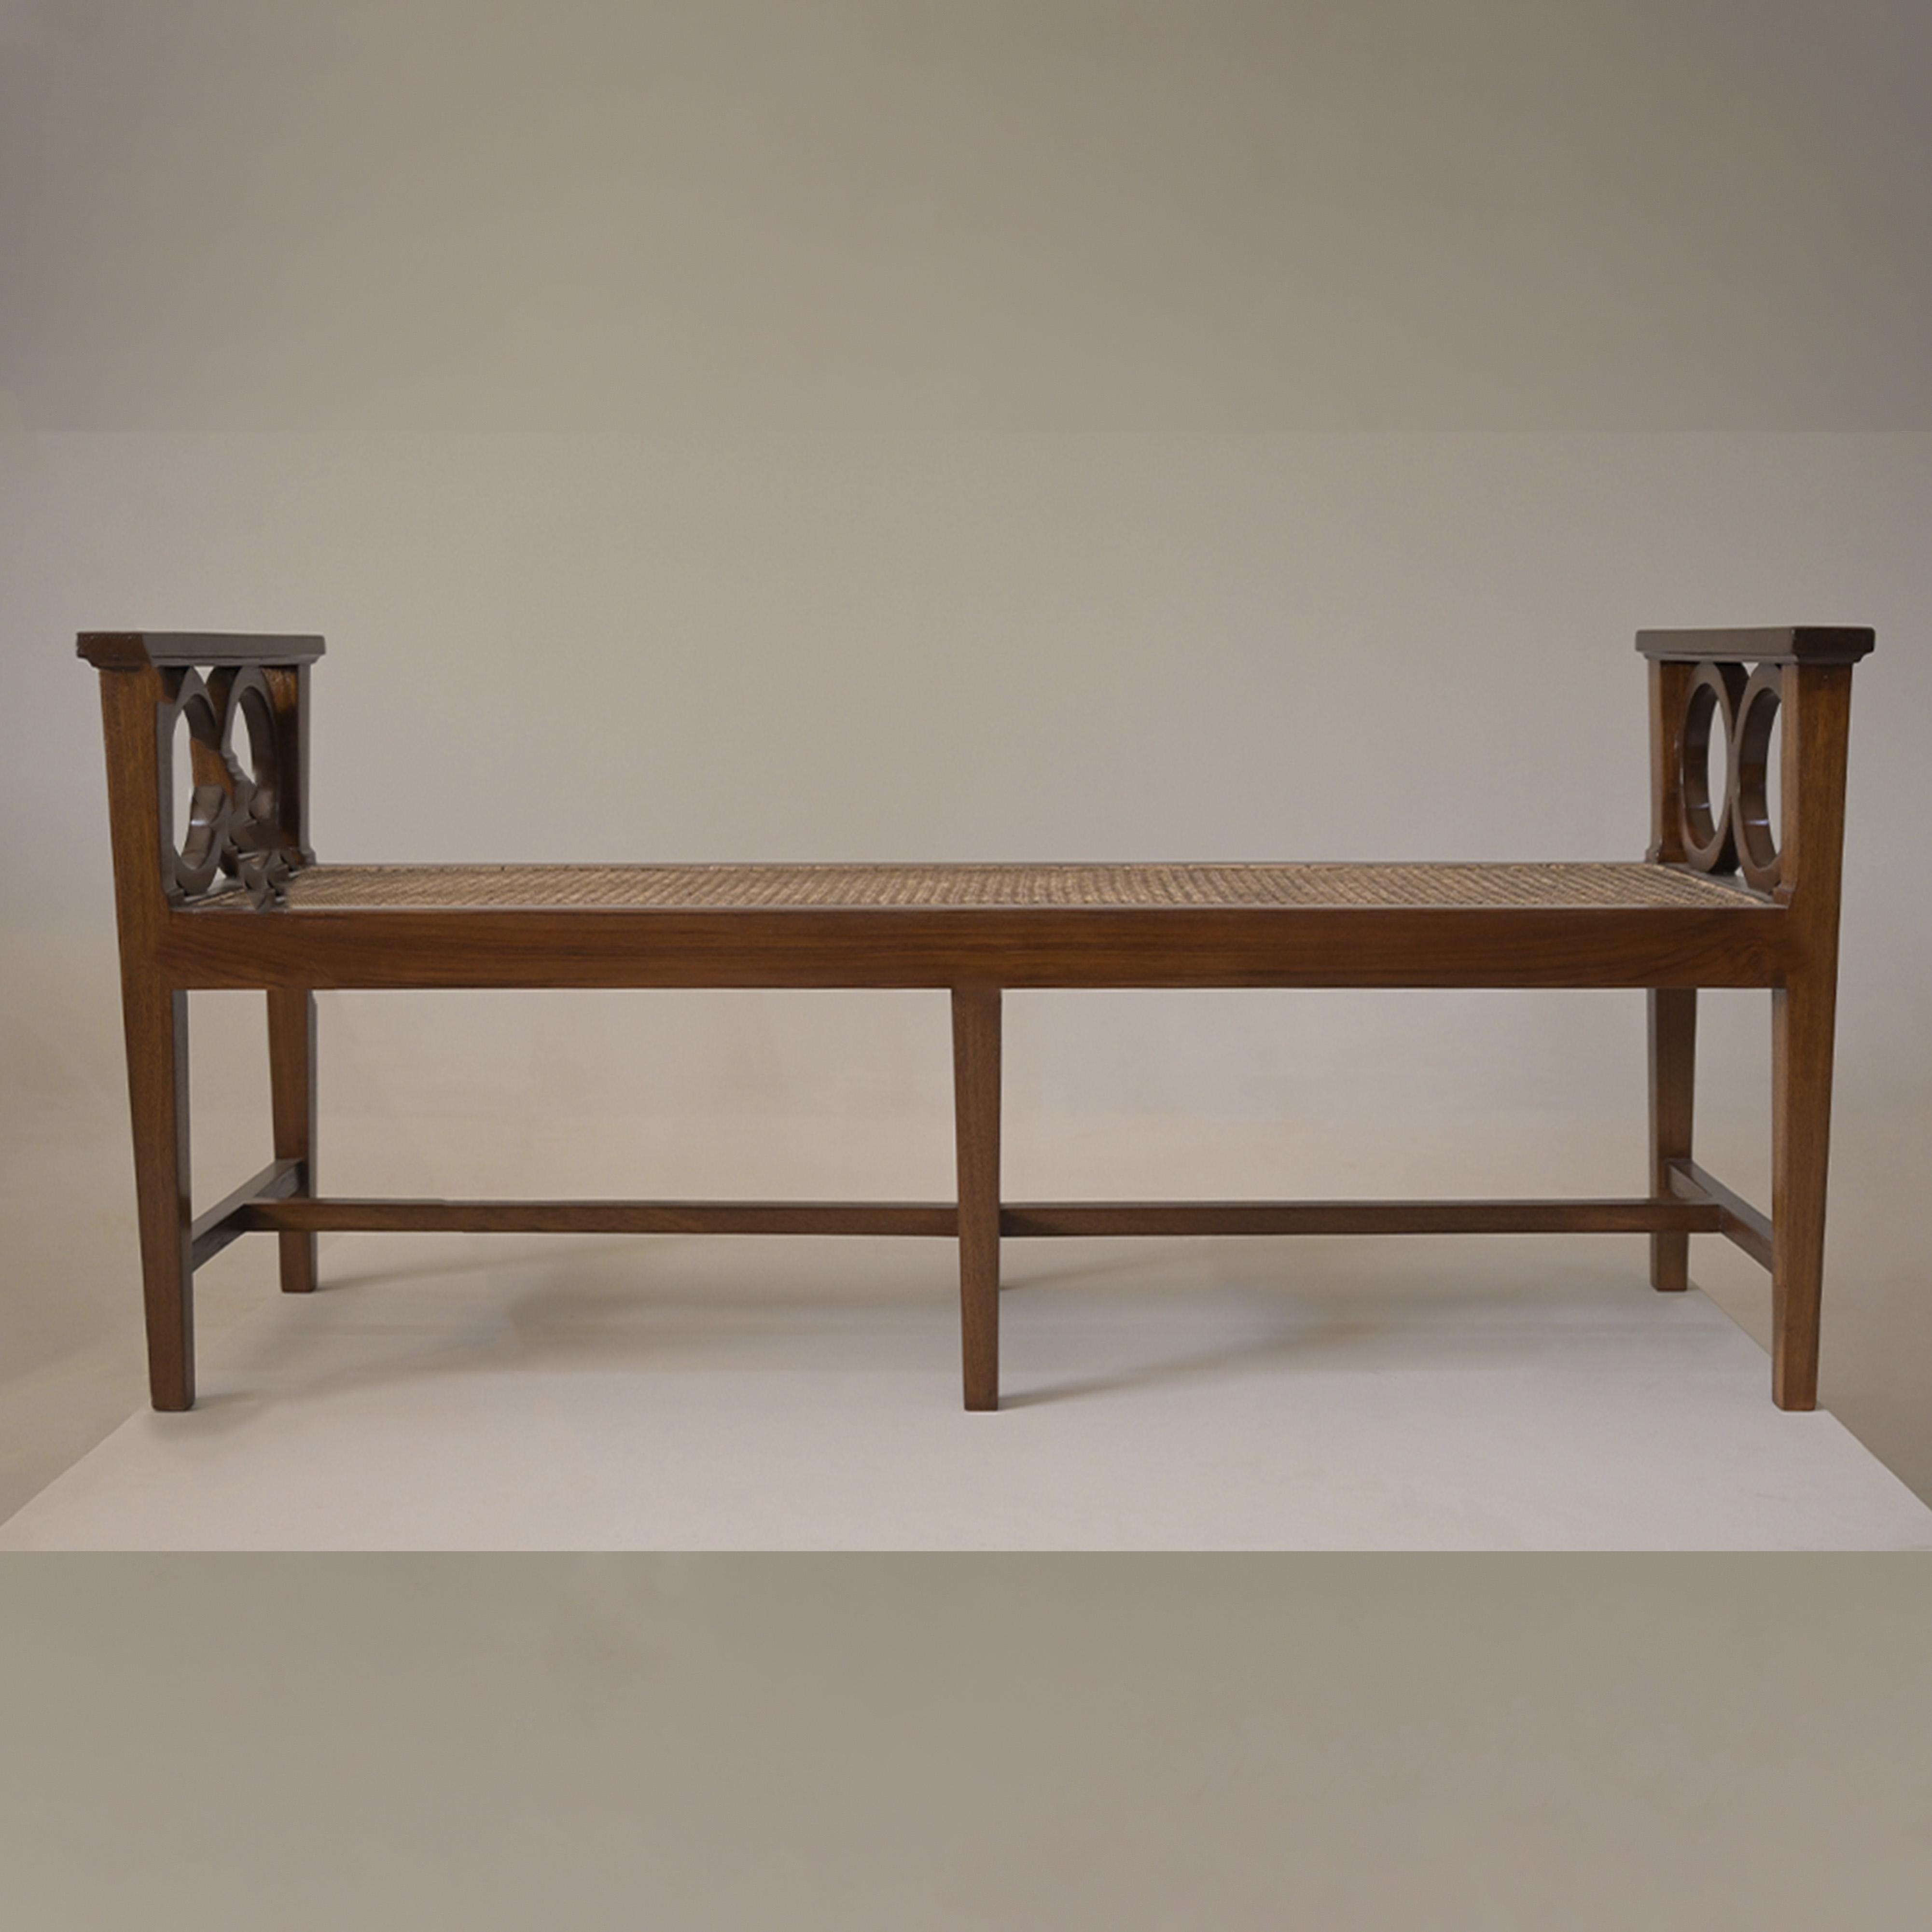 Guild bench